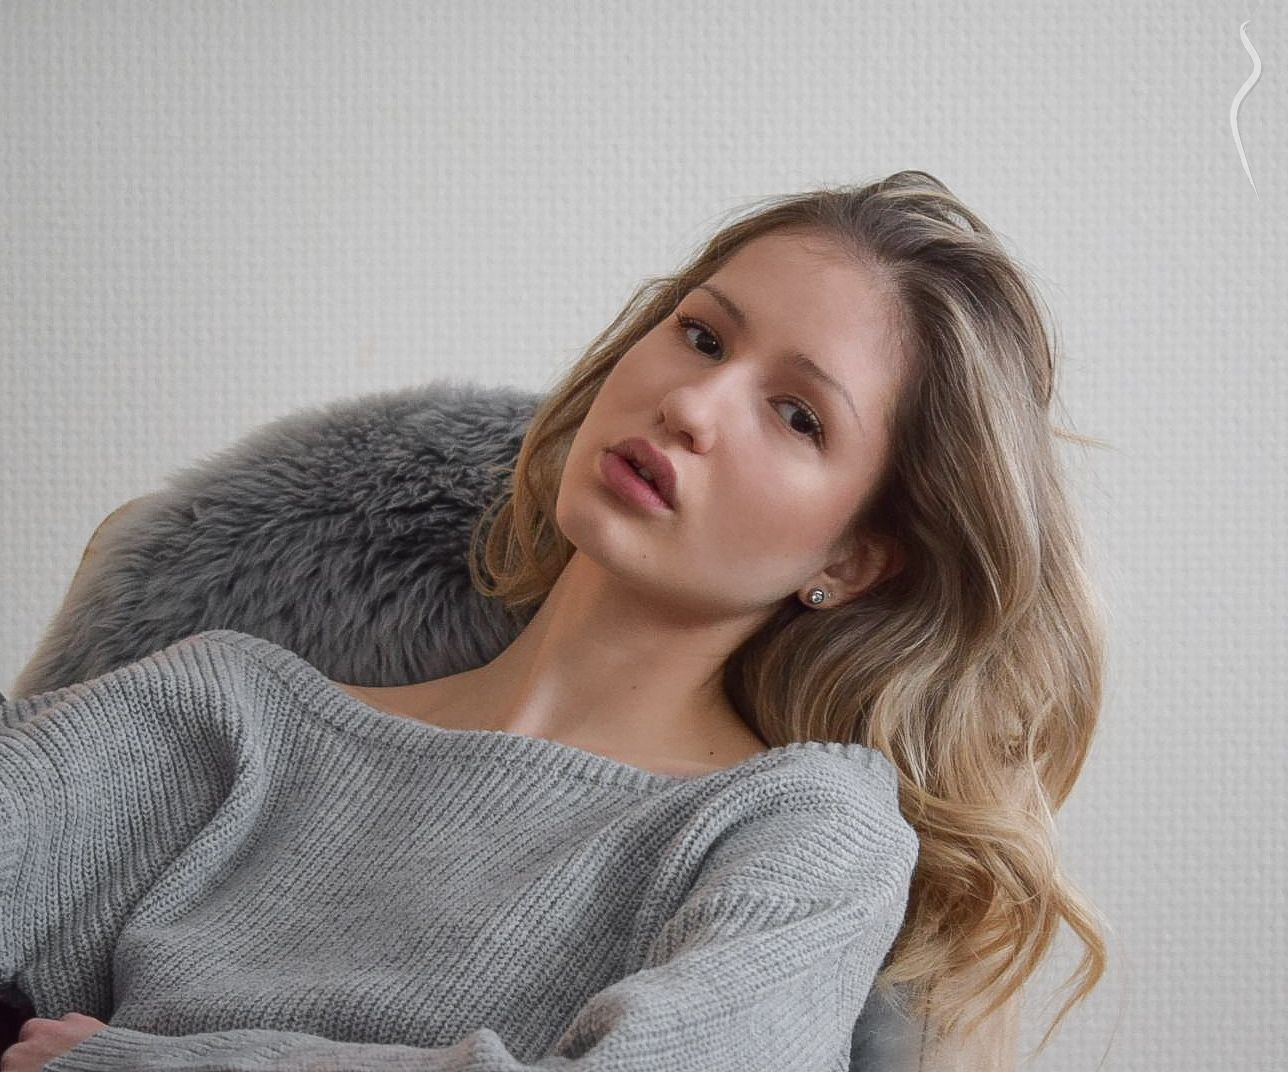 Natalie Honkonen - a model from Finland   Model Management